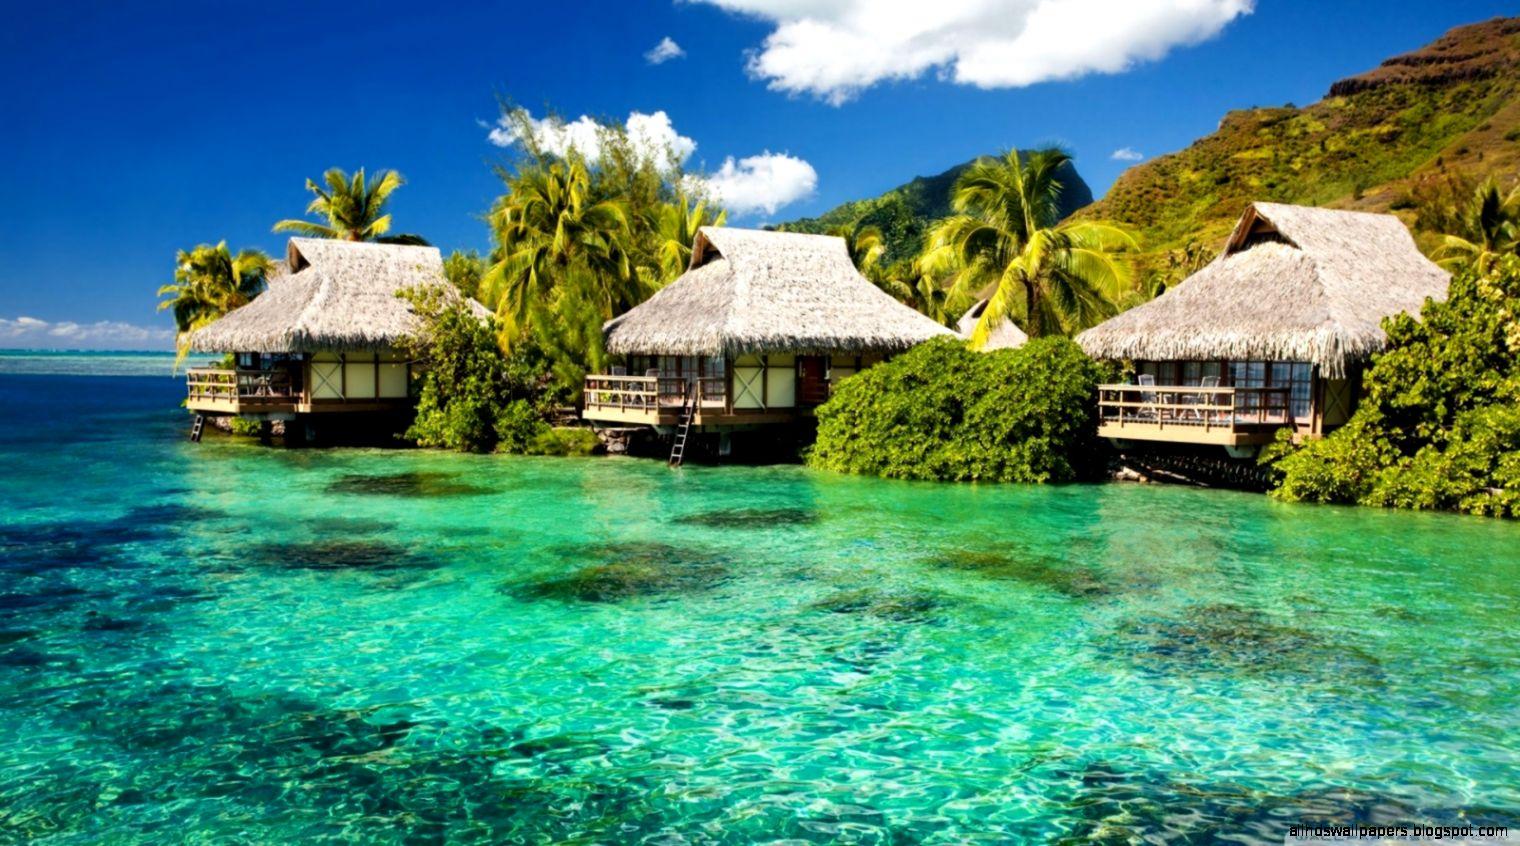 Water Bungalows On A Tropical Island HD desktop wallpaper  High